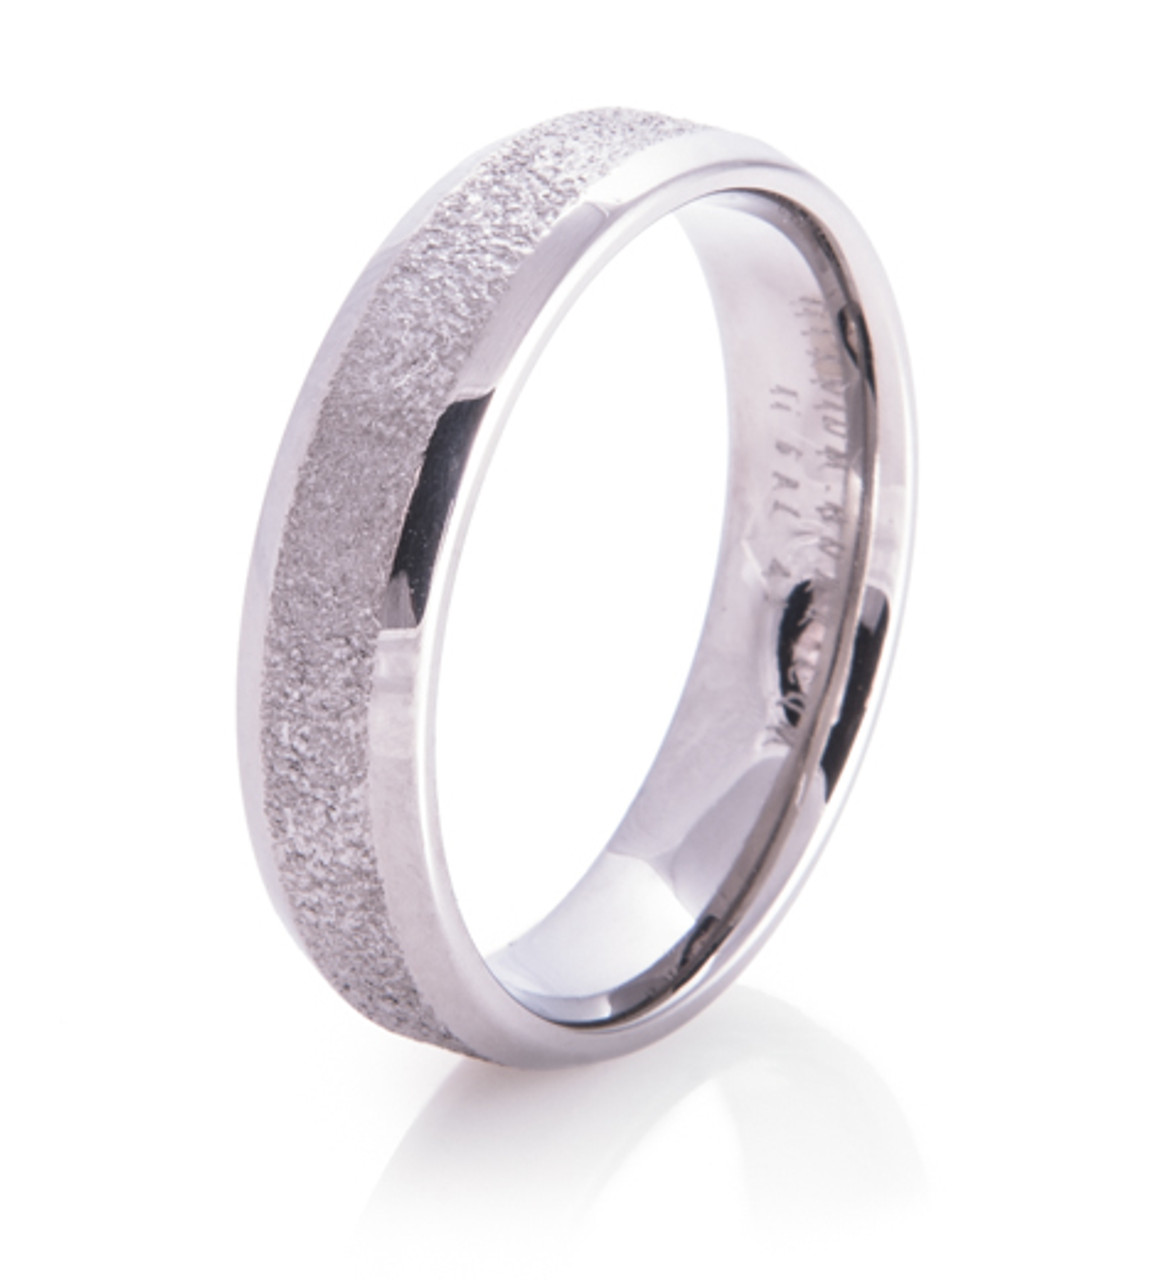 Wedding Band Series: Icy Path Arctic Series Titanium Wedding Ring By Titanium-Buzz